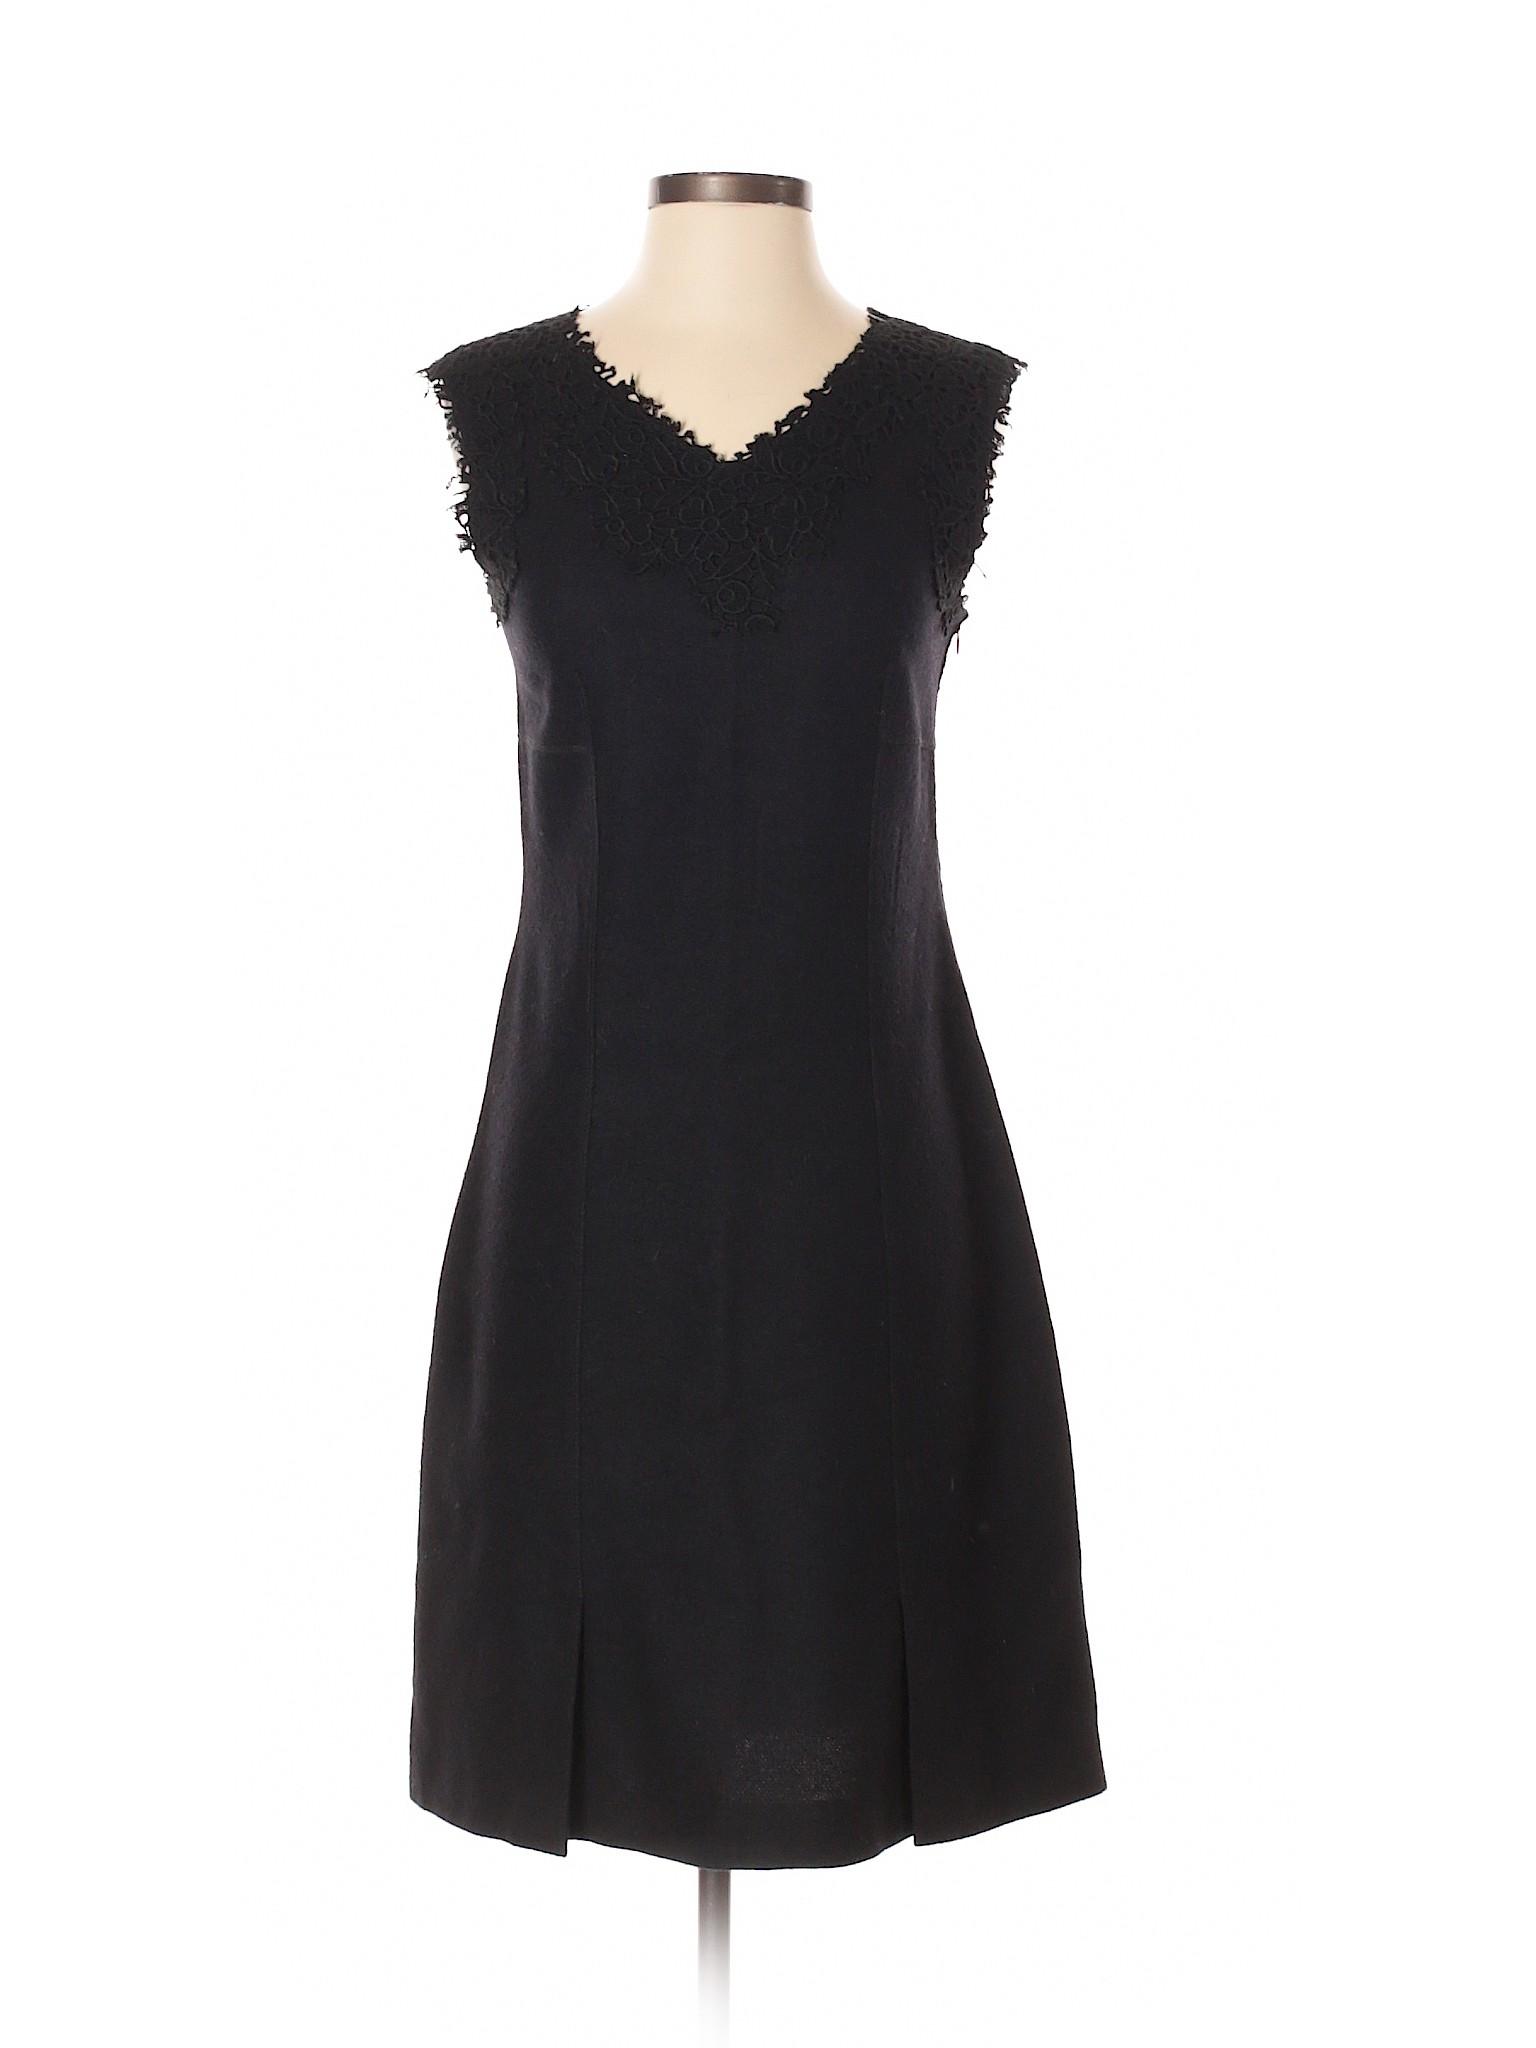 Cenci Casual Dress Davide winter Boutique Etq86nwp